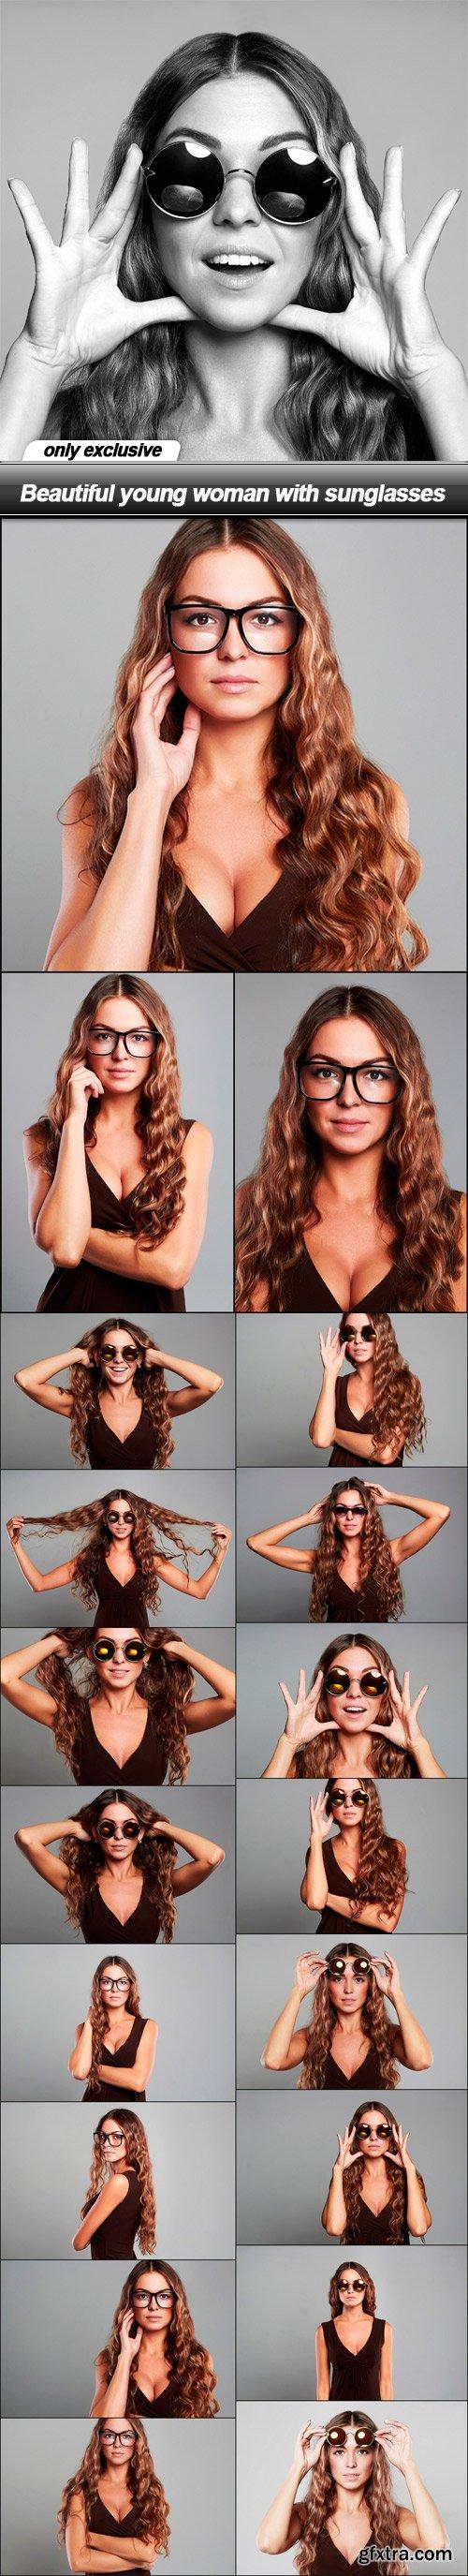 Beautiful young woman with sunglasses - 20 UHQ JPEG